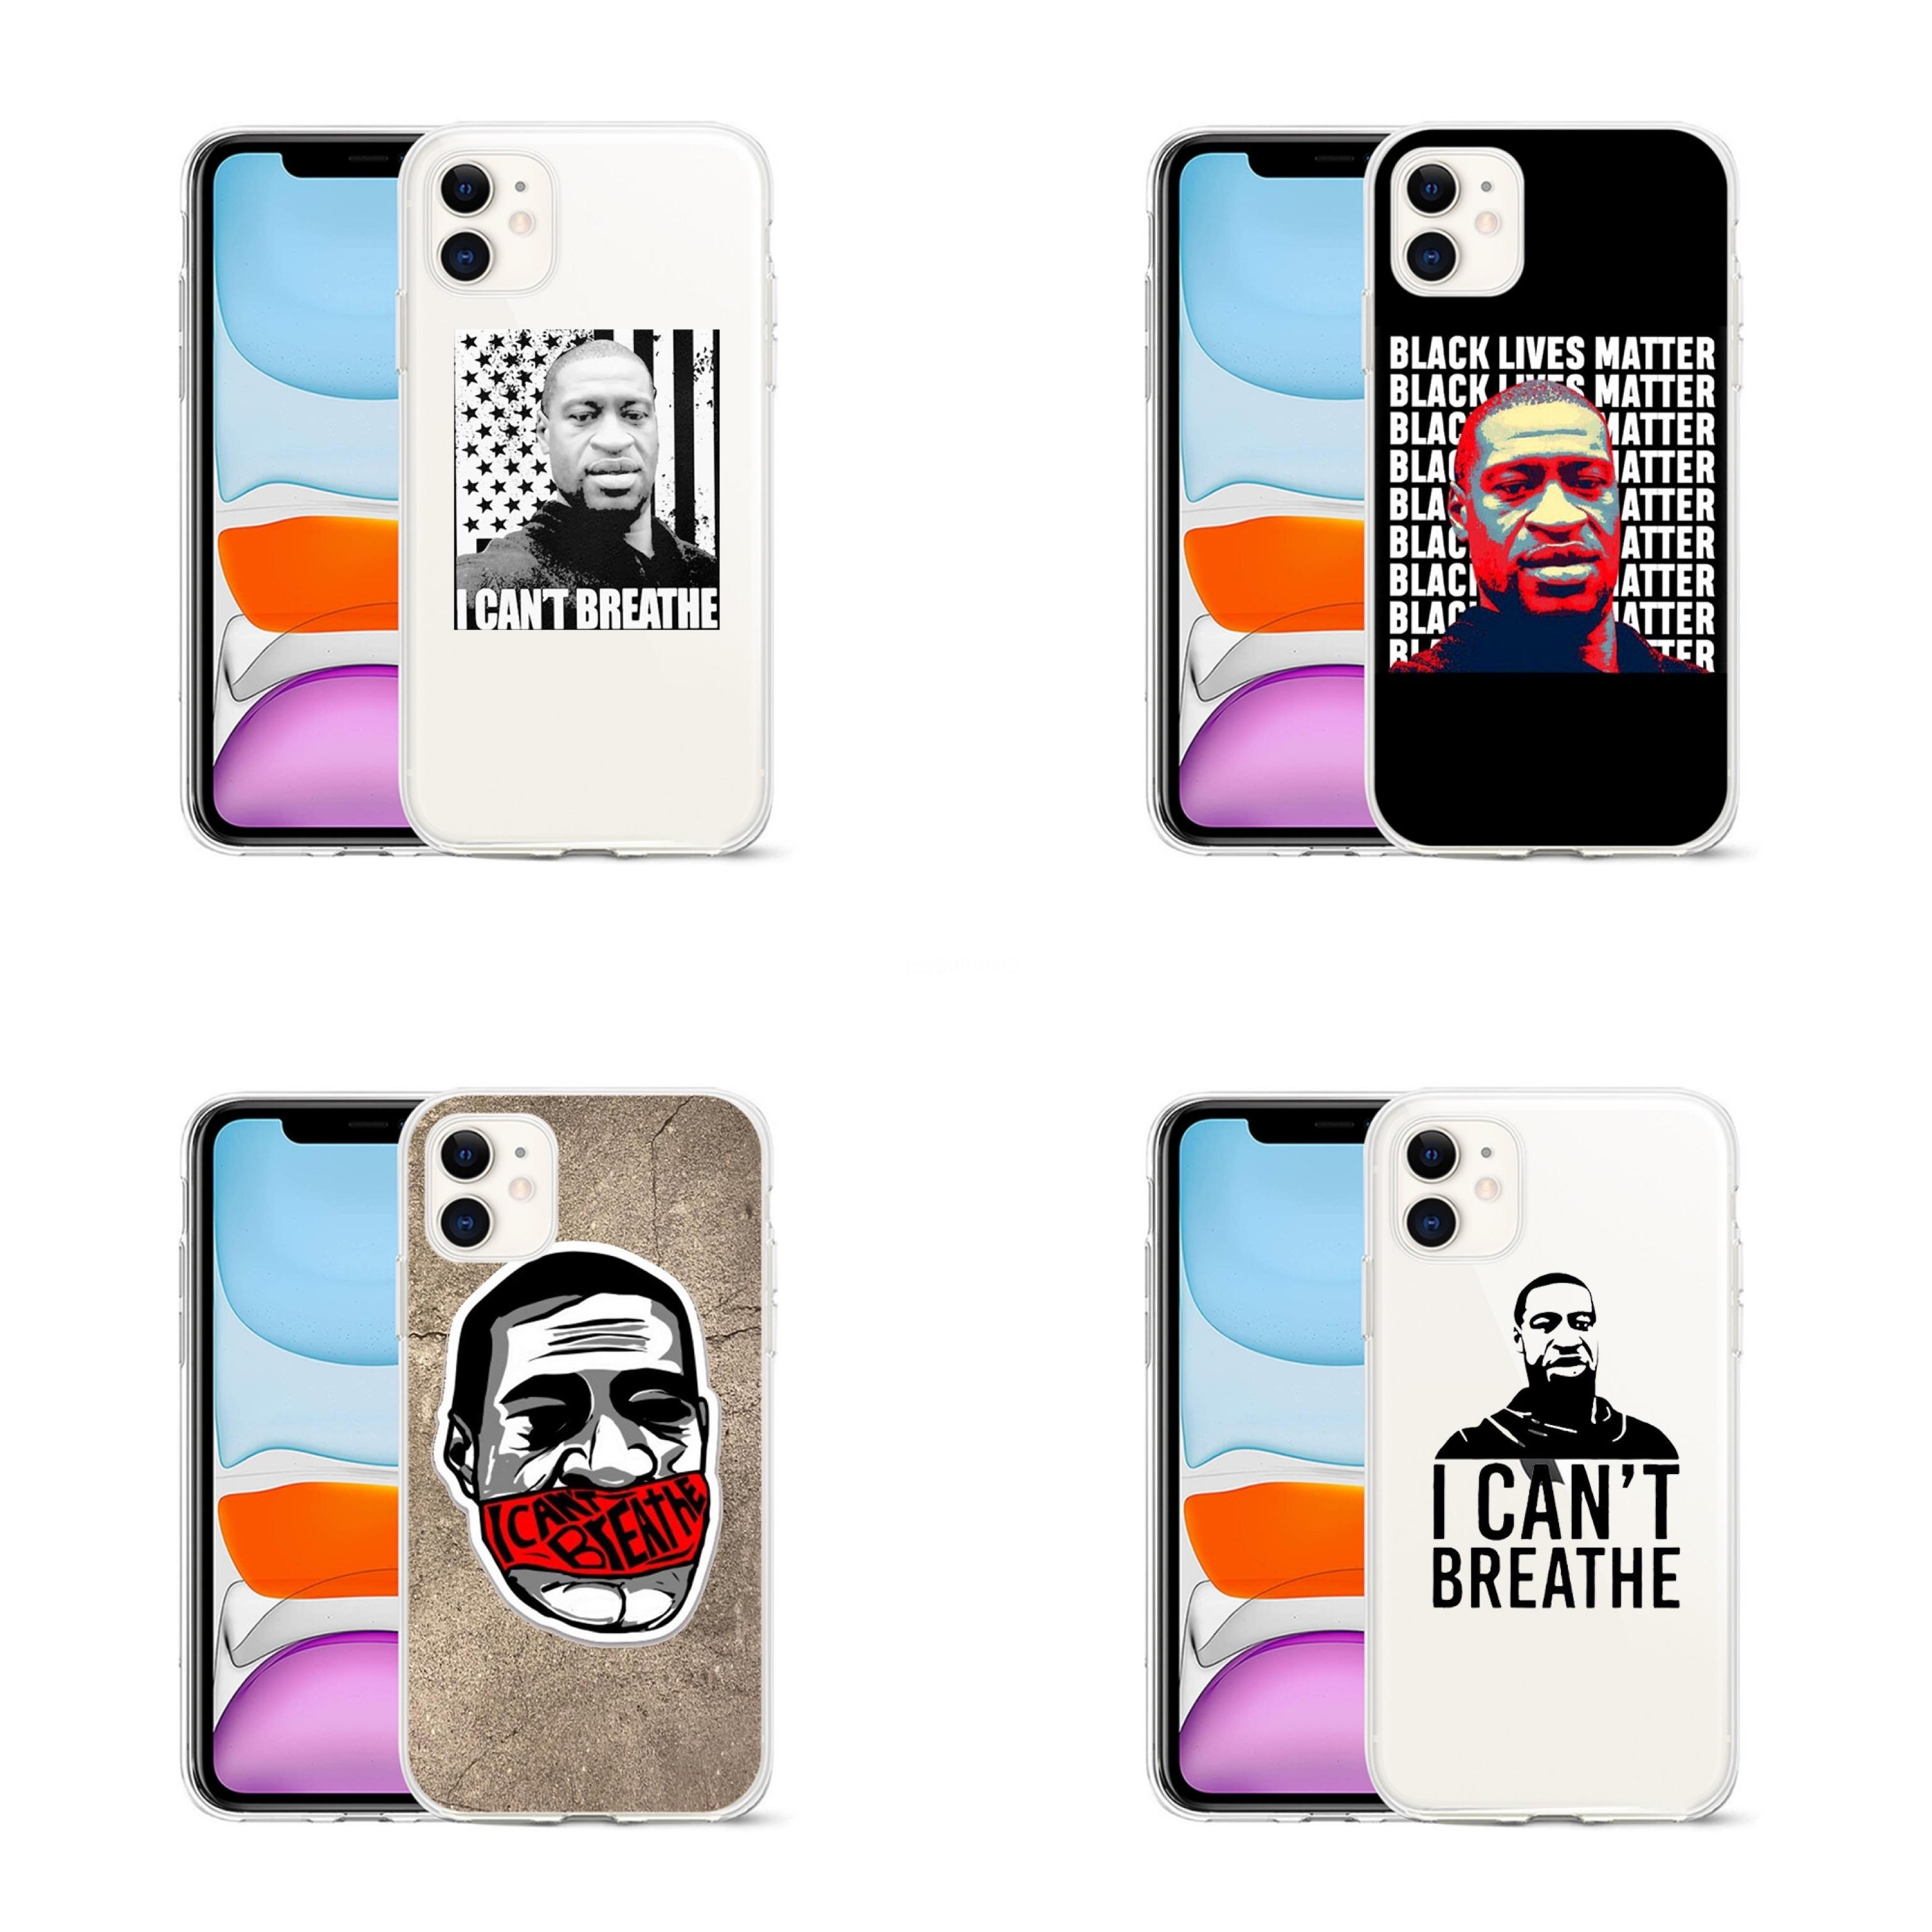 DesignerPhoneCase Phone Case For Samsung Galaxy A30 Case 3D Pattern Soft Silicoen Cover For Samsung Galaxy A20 Case Coque A205F A305 #OU755